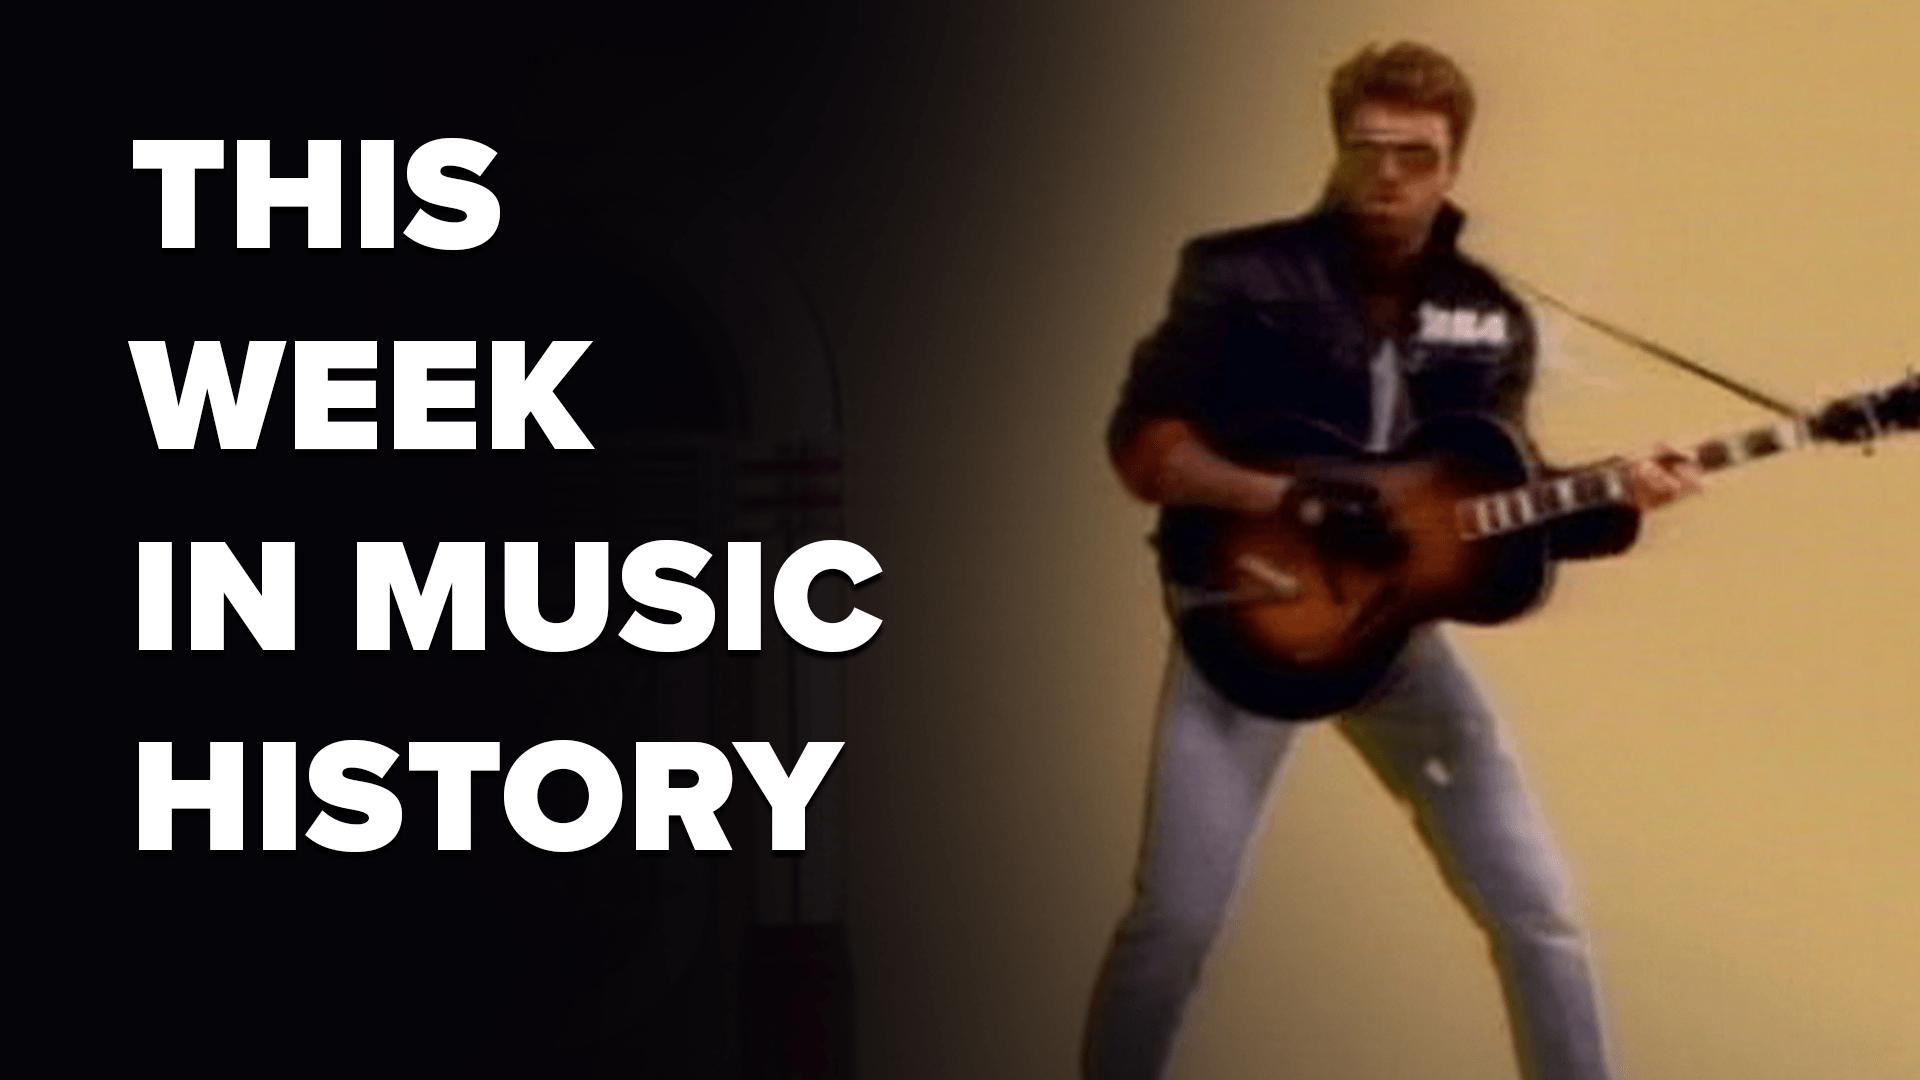 October 26 - November 1 | This Week in Music History